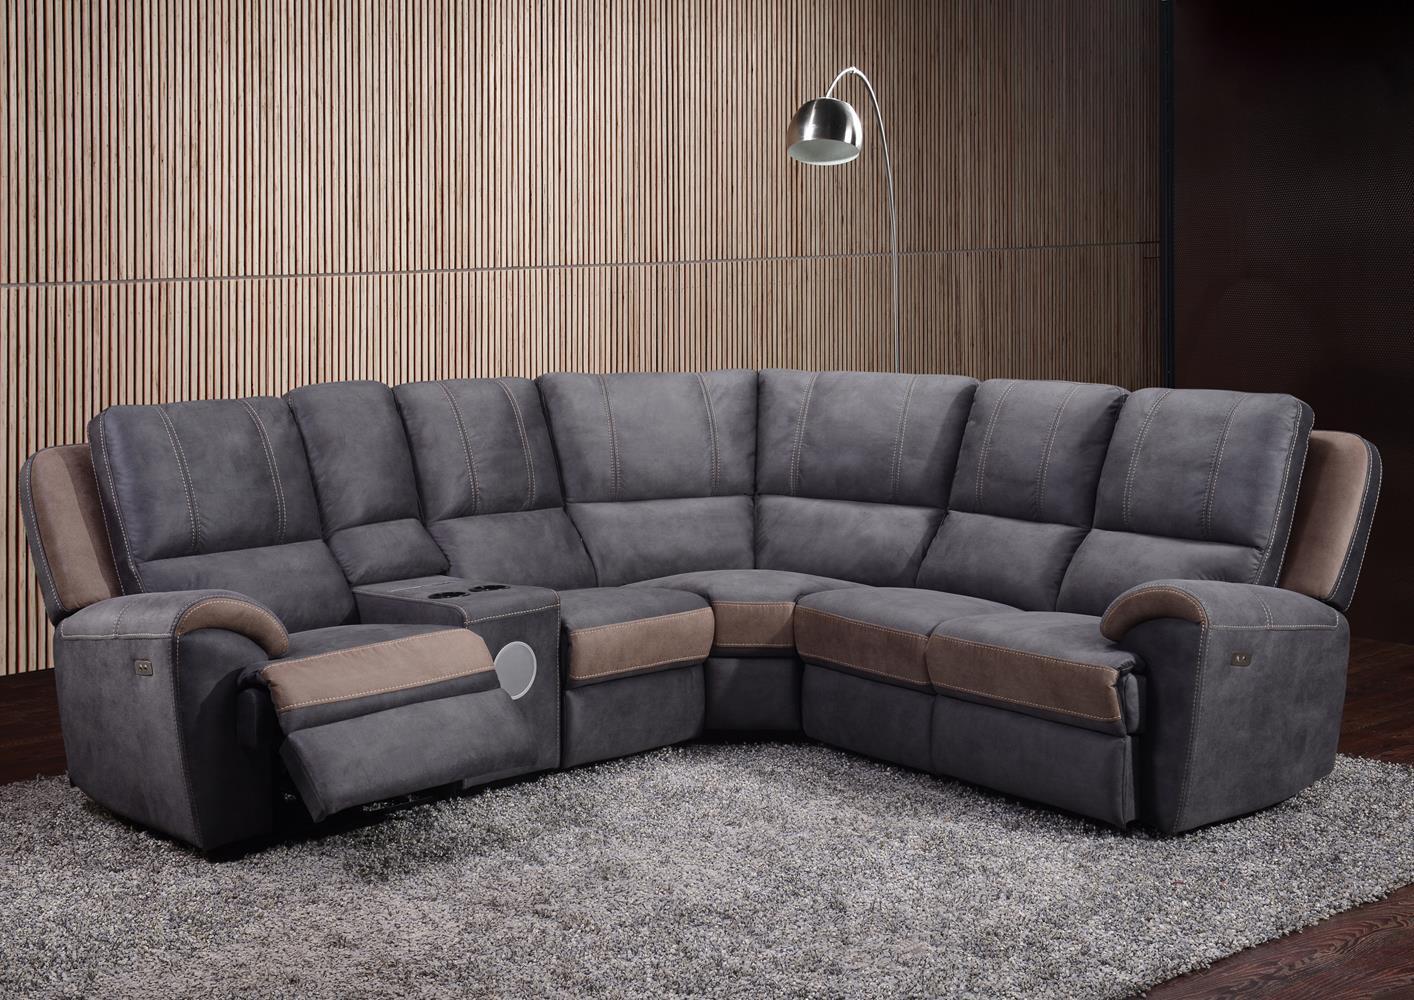 Grand Canapé D'angle Avec Relax En Microfibre concernant Acheter Canape D Angle